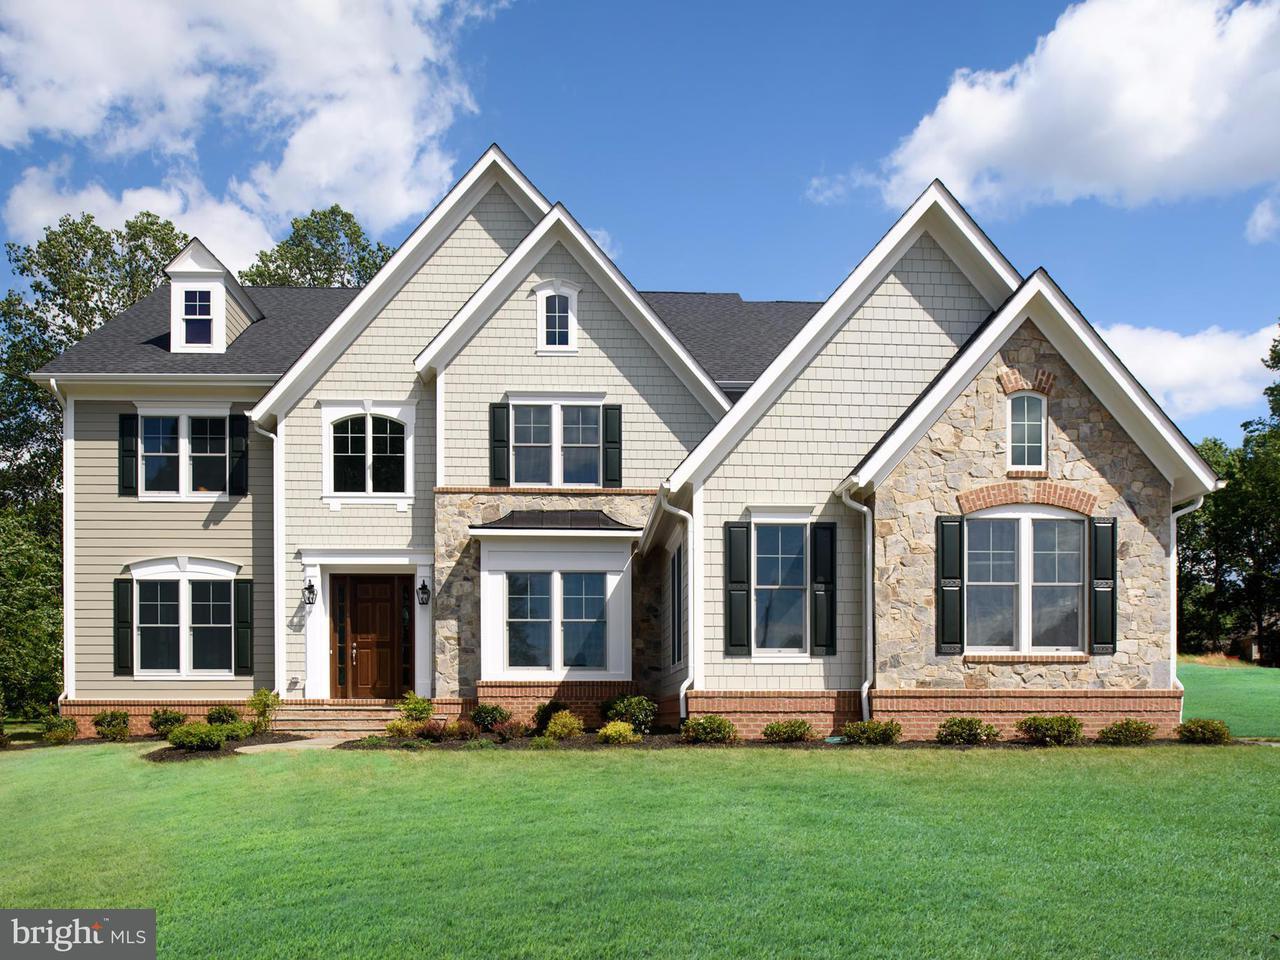 Single Family Home for Sale at 11005 Tradewind Drive 11005 Tradewind Drive Oakton, Virginia 22124 United States